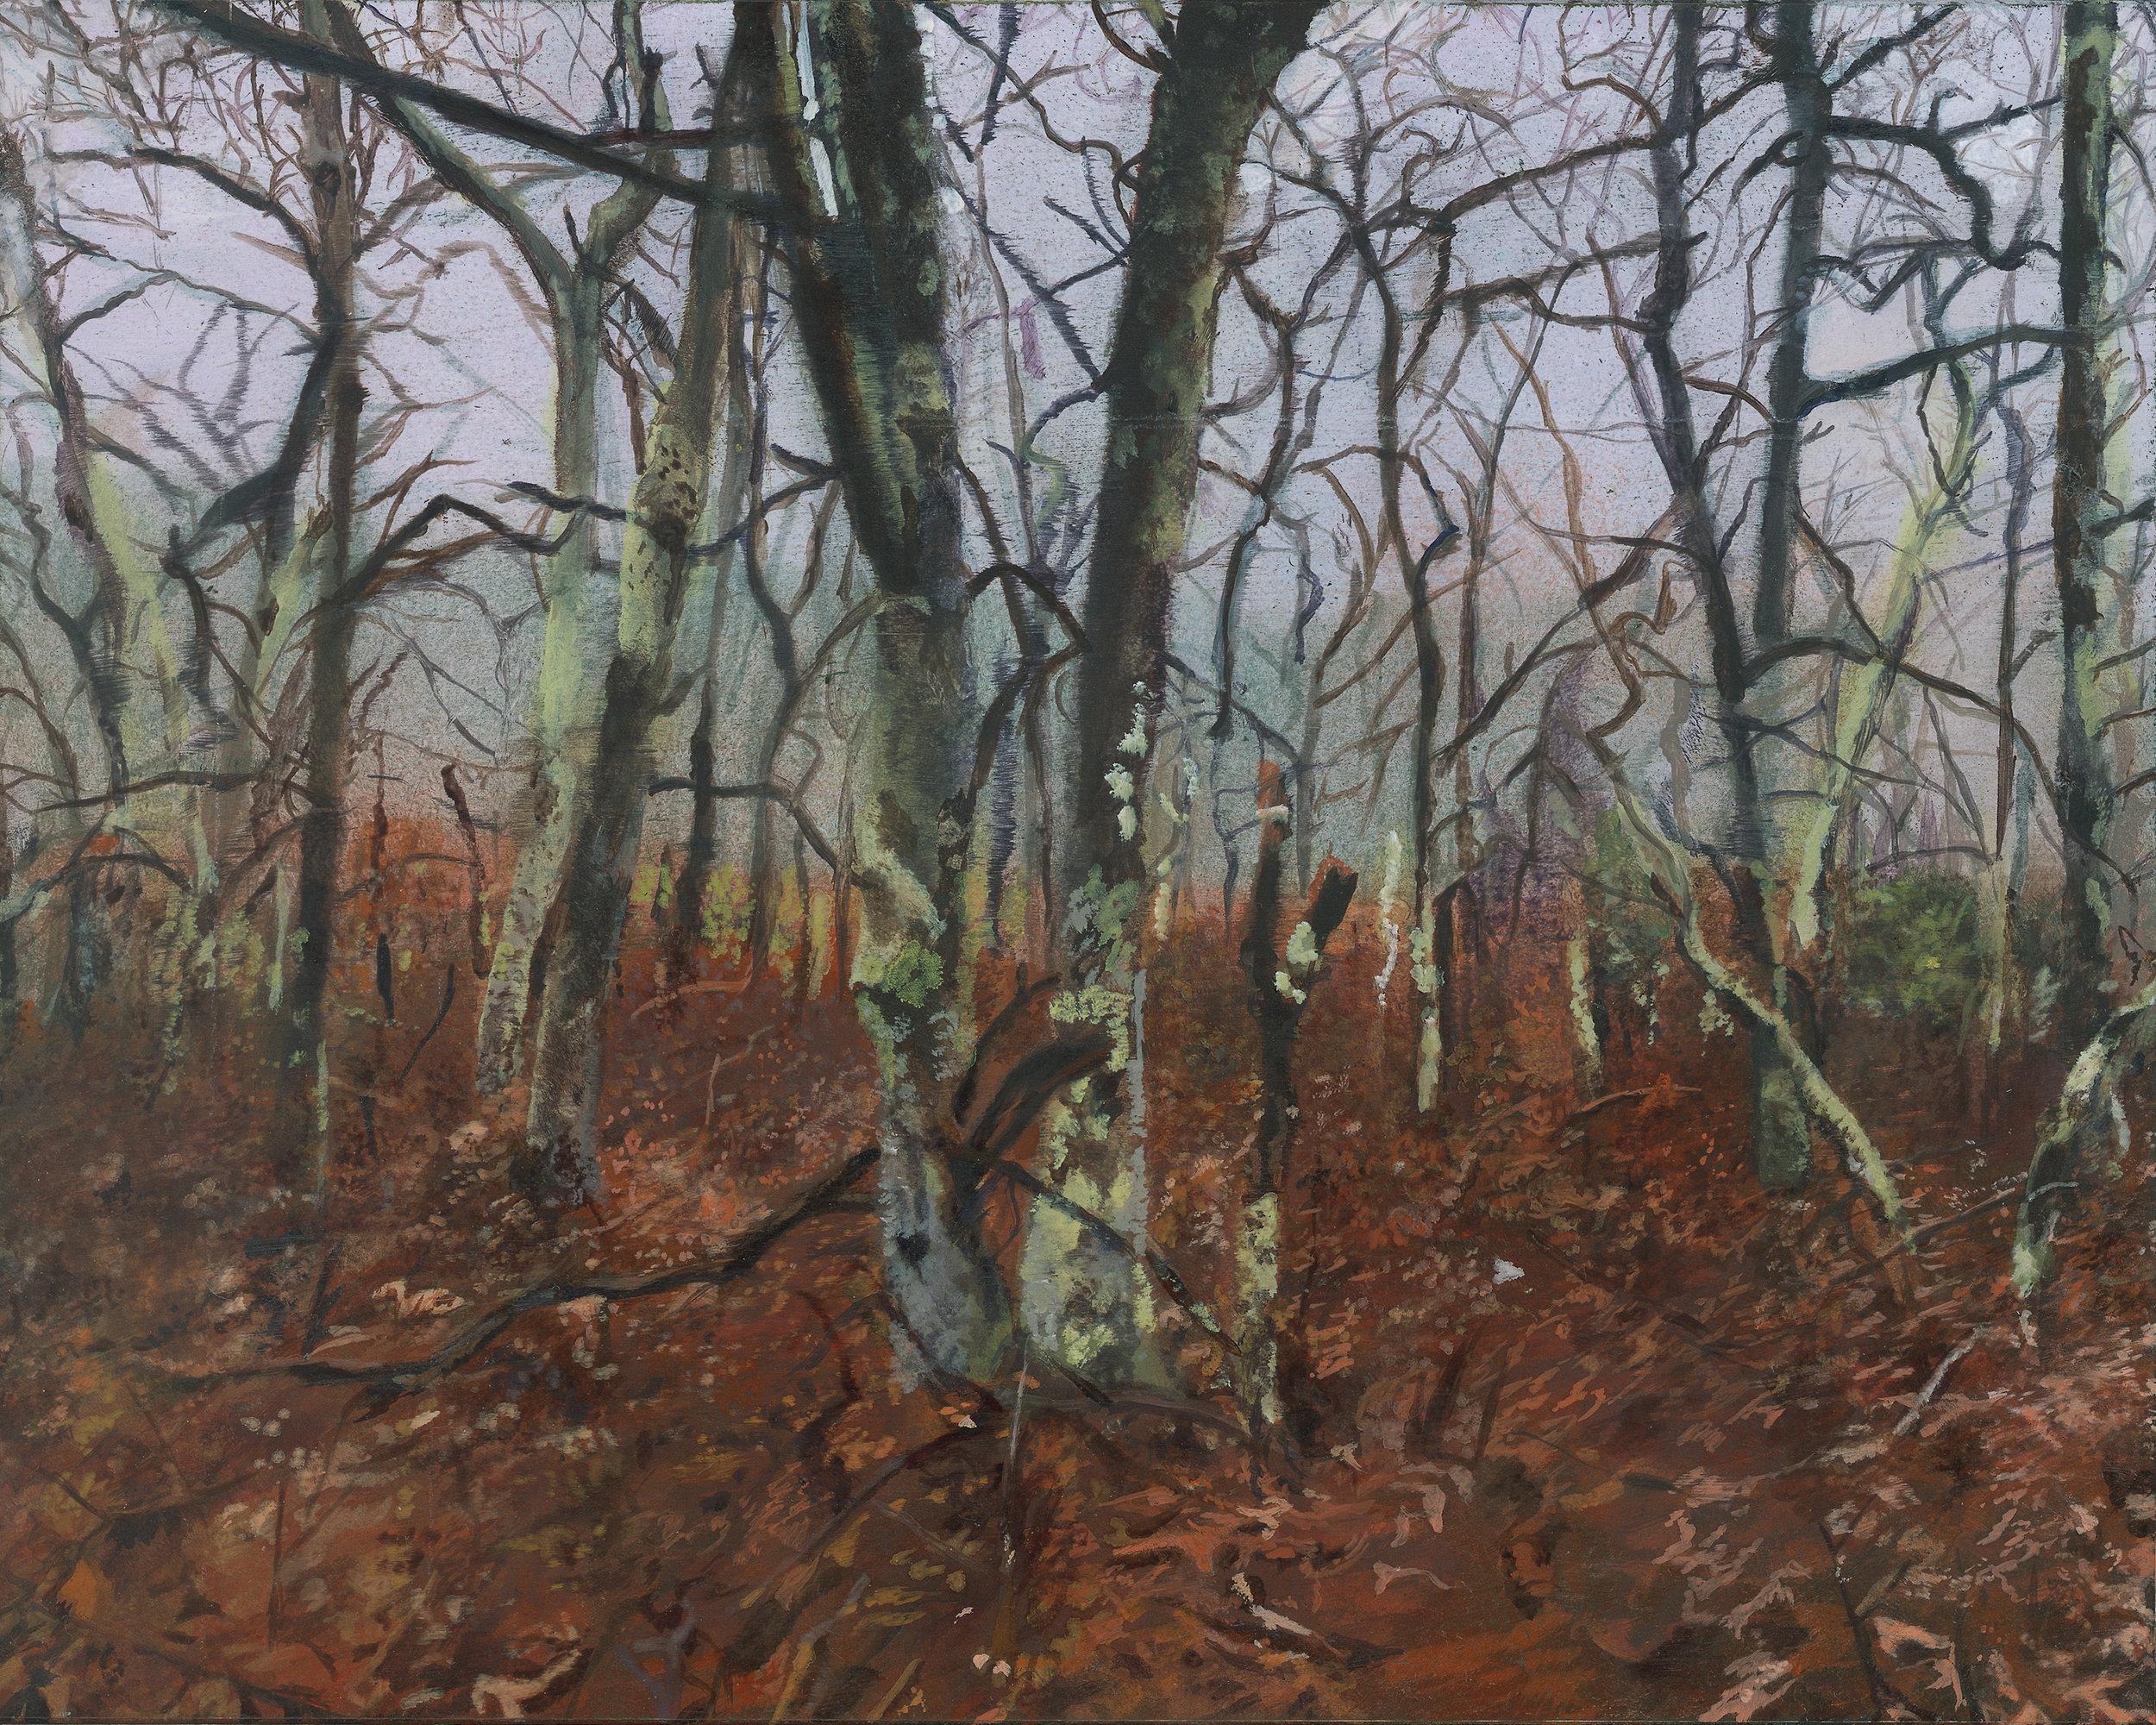 Emma Tapley: Forest, Sag Harbor